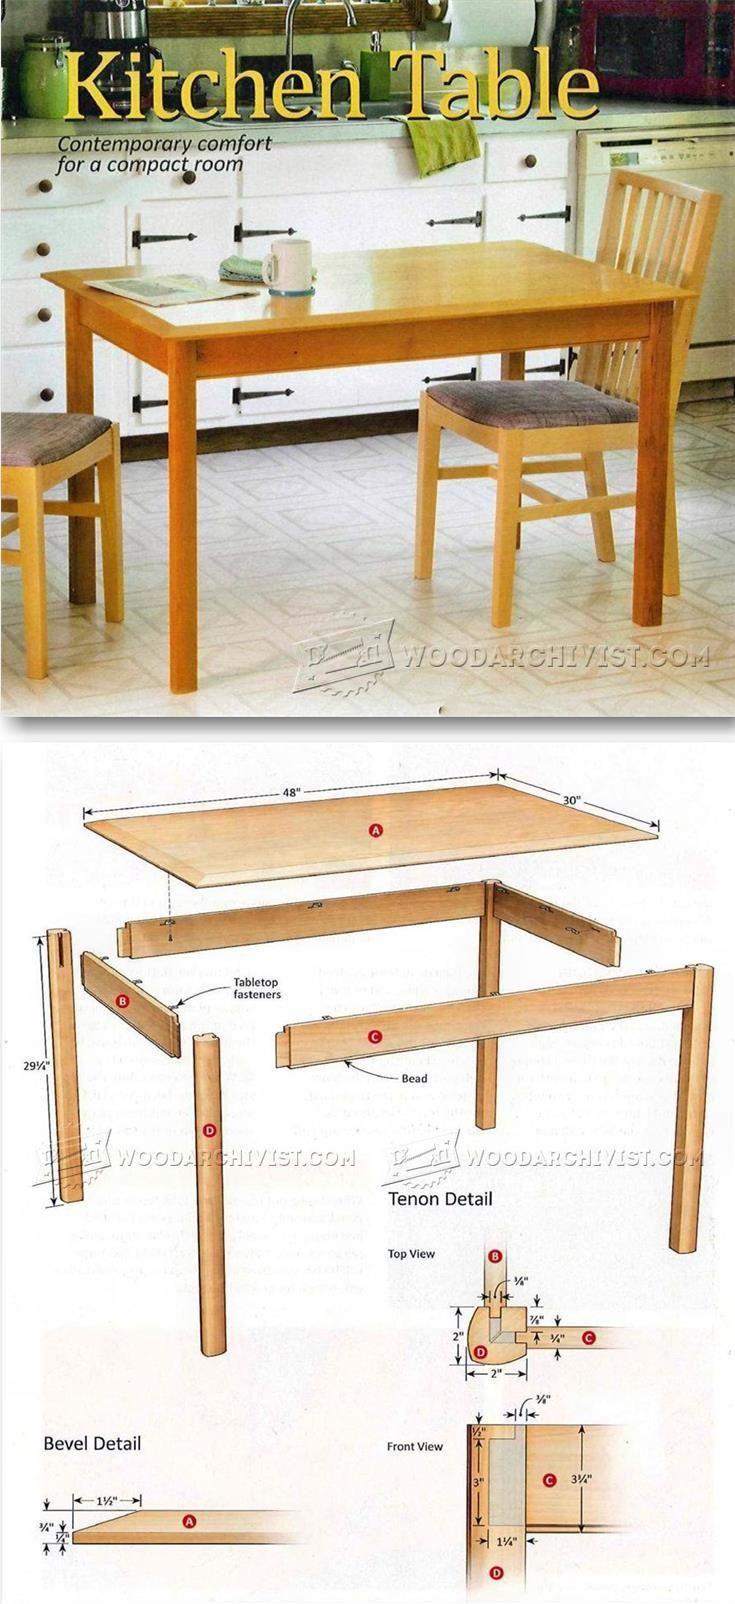 wood furniture blueprints. Kitchen Table Plans - Furniture And Projects   WoodArchivist.com Wood Blueprints